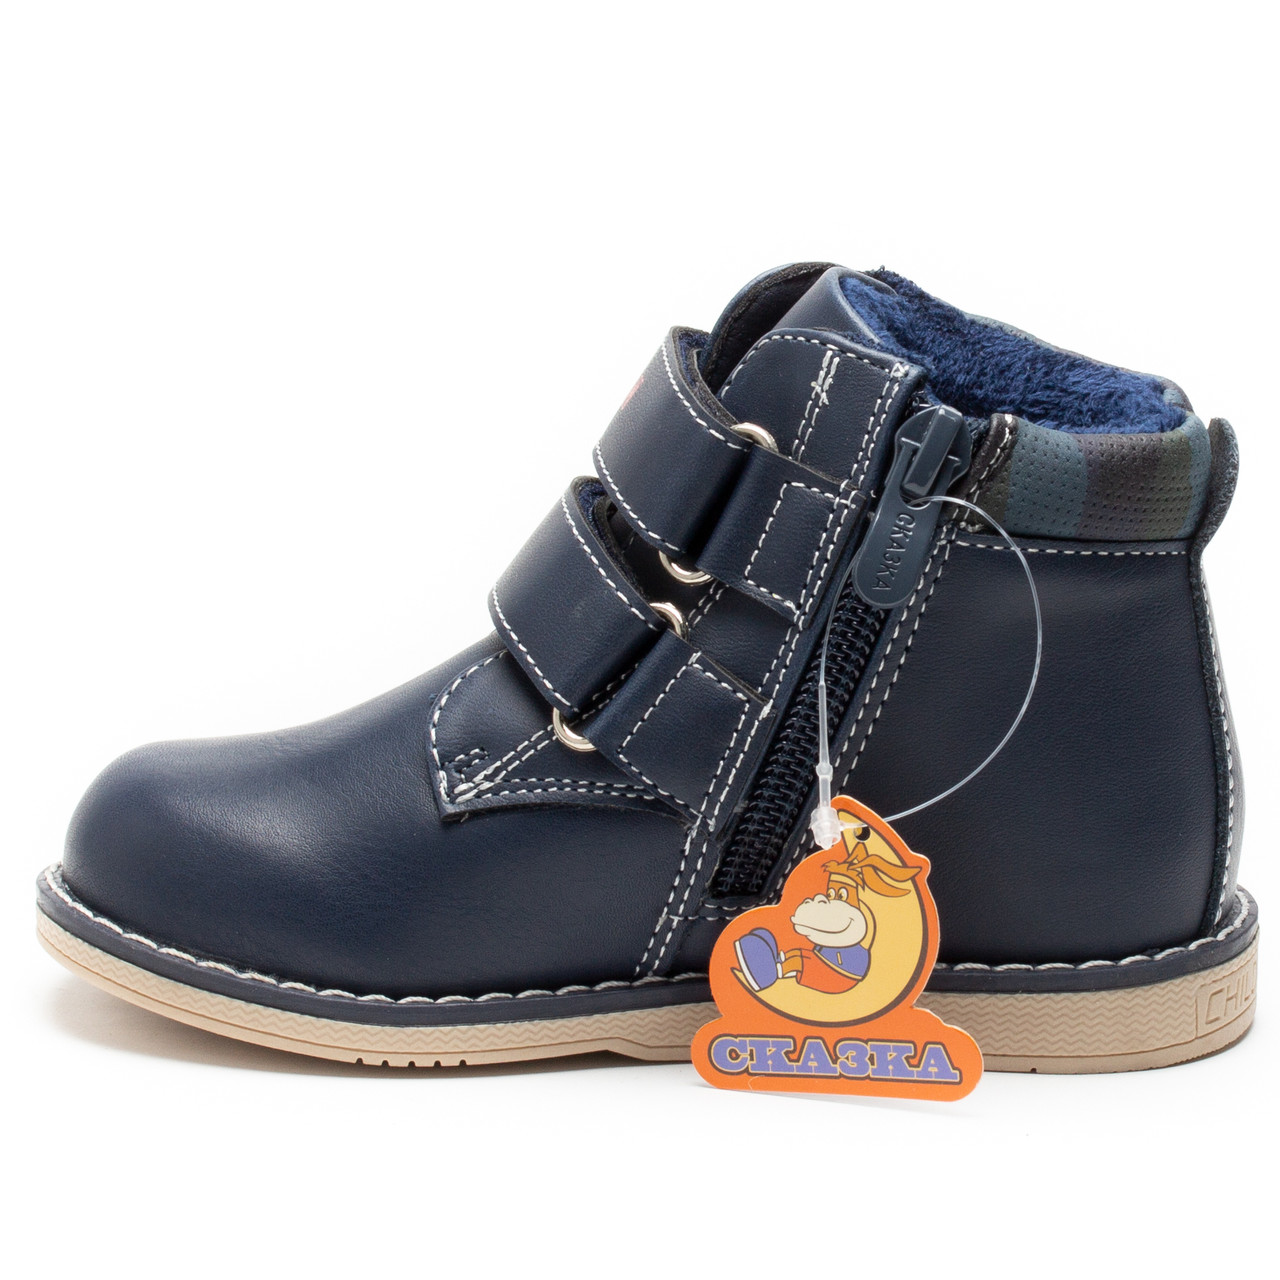 1e5f6ddd2 ... Демисезонные ботинки для мальчика ТМ